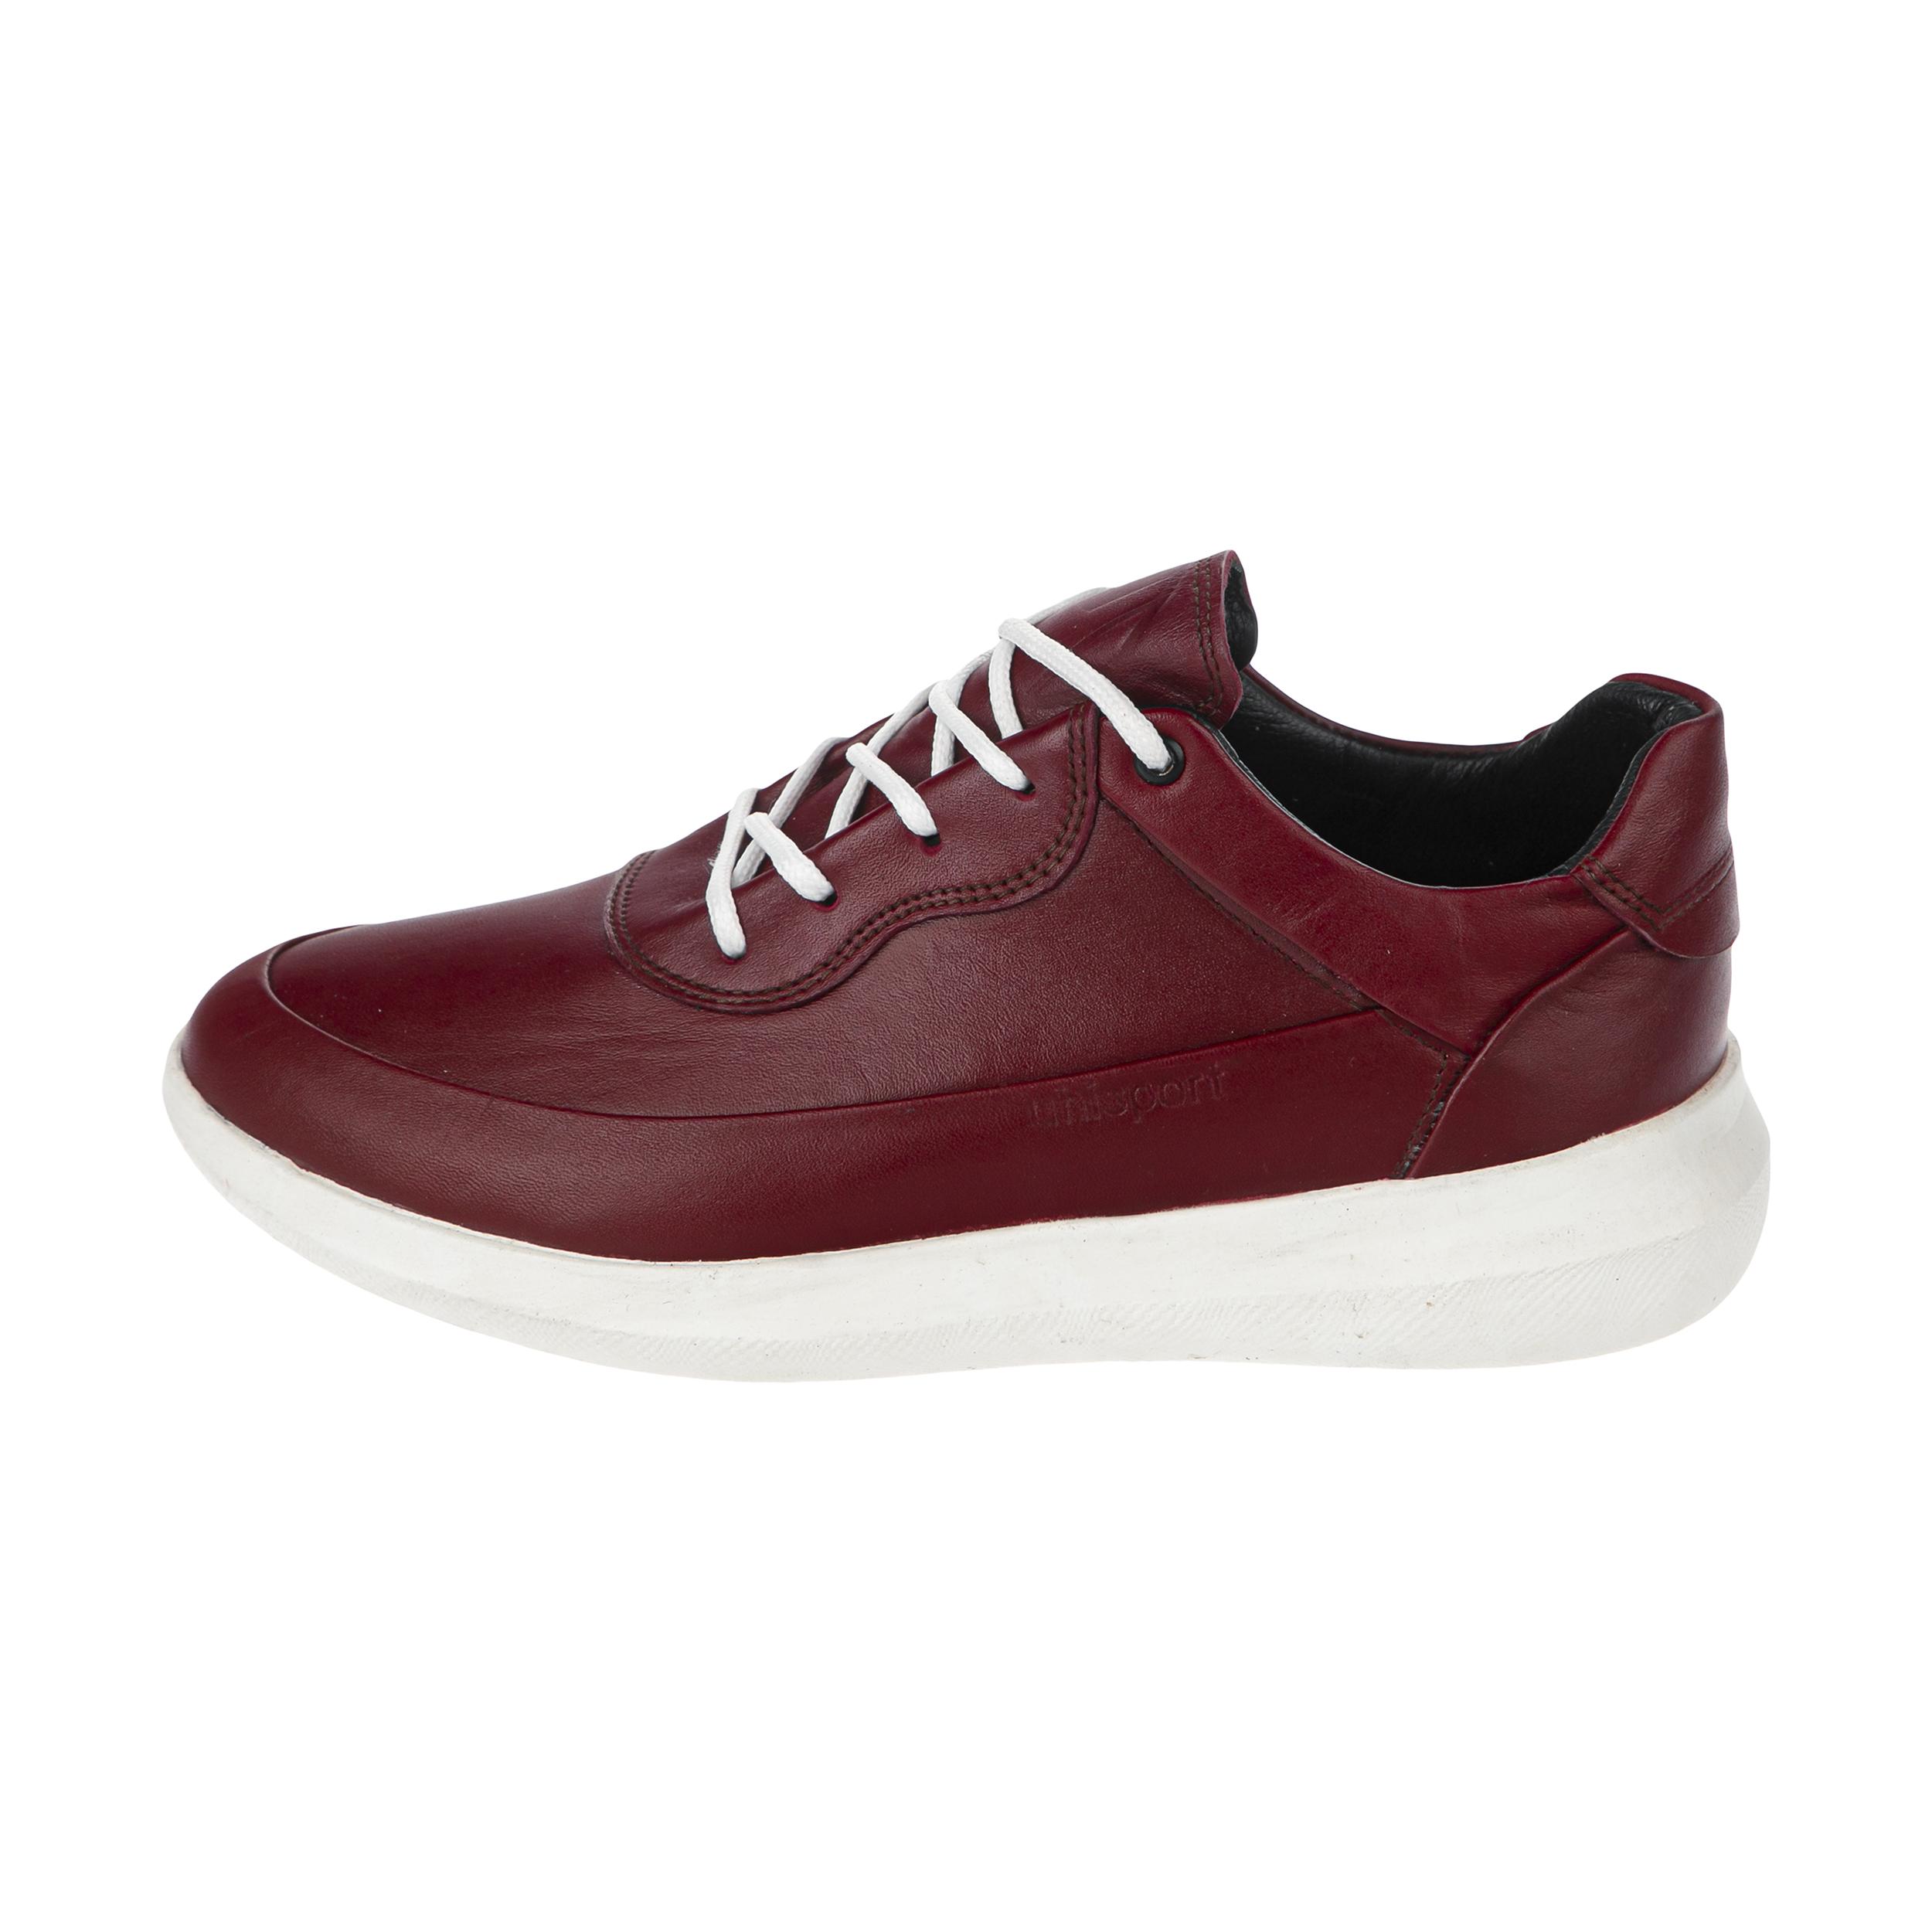 کفش راحتی زنانه آلشپرت مدل WUH797-008